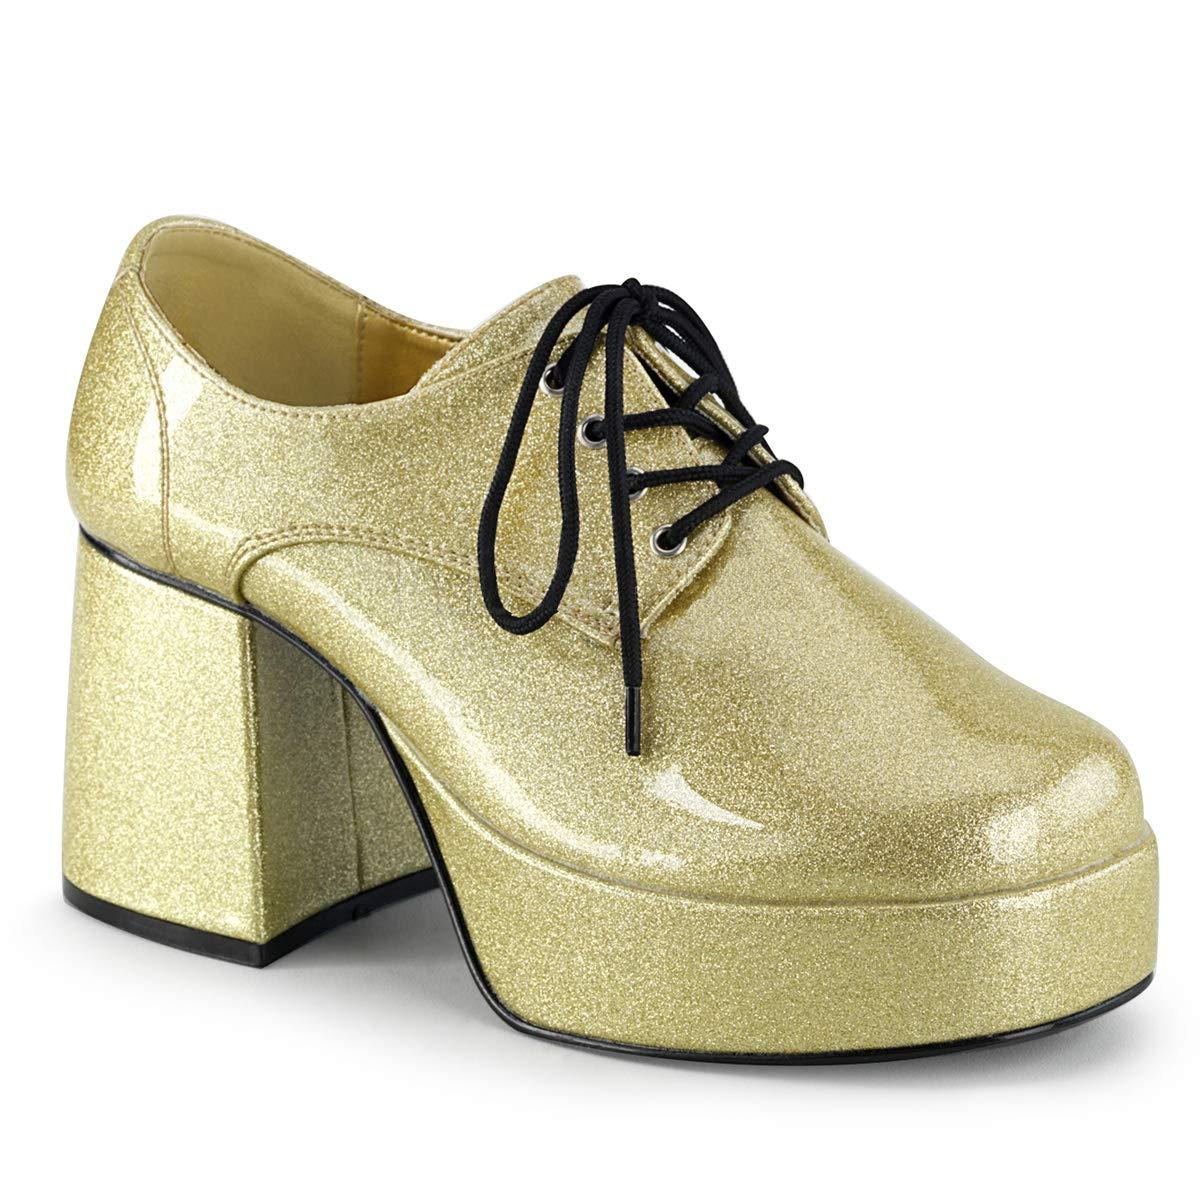 Higher-Heels Funtasma 70s Herren Disko Glitzer Plateauschuhe Jazz-02G Glitter Glitter Glitter B00B88SPKU Tanzschuhe Neuer Eintrag 89b5fd